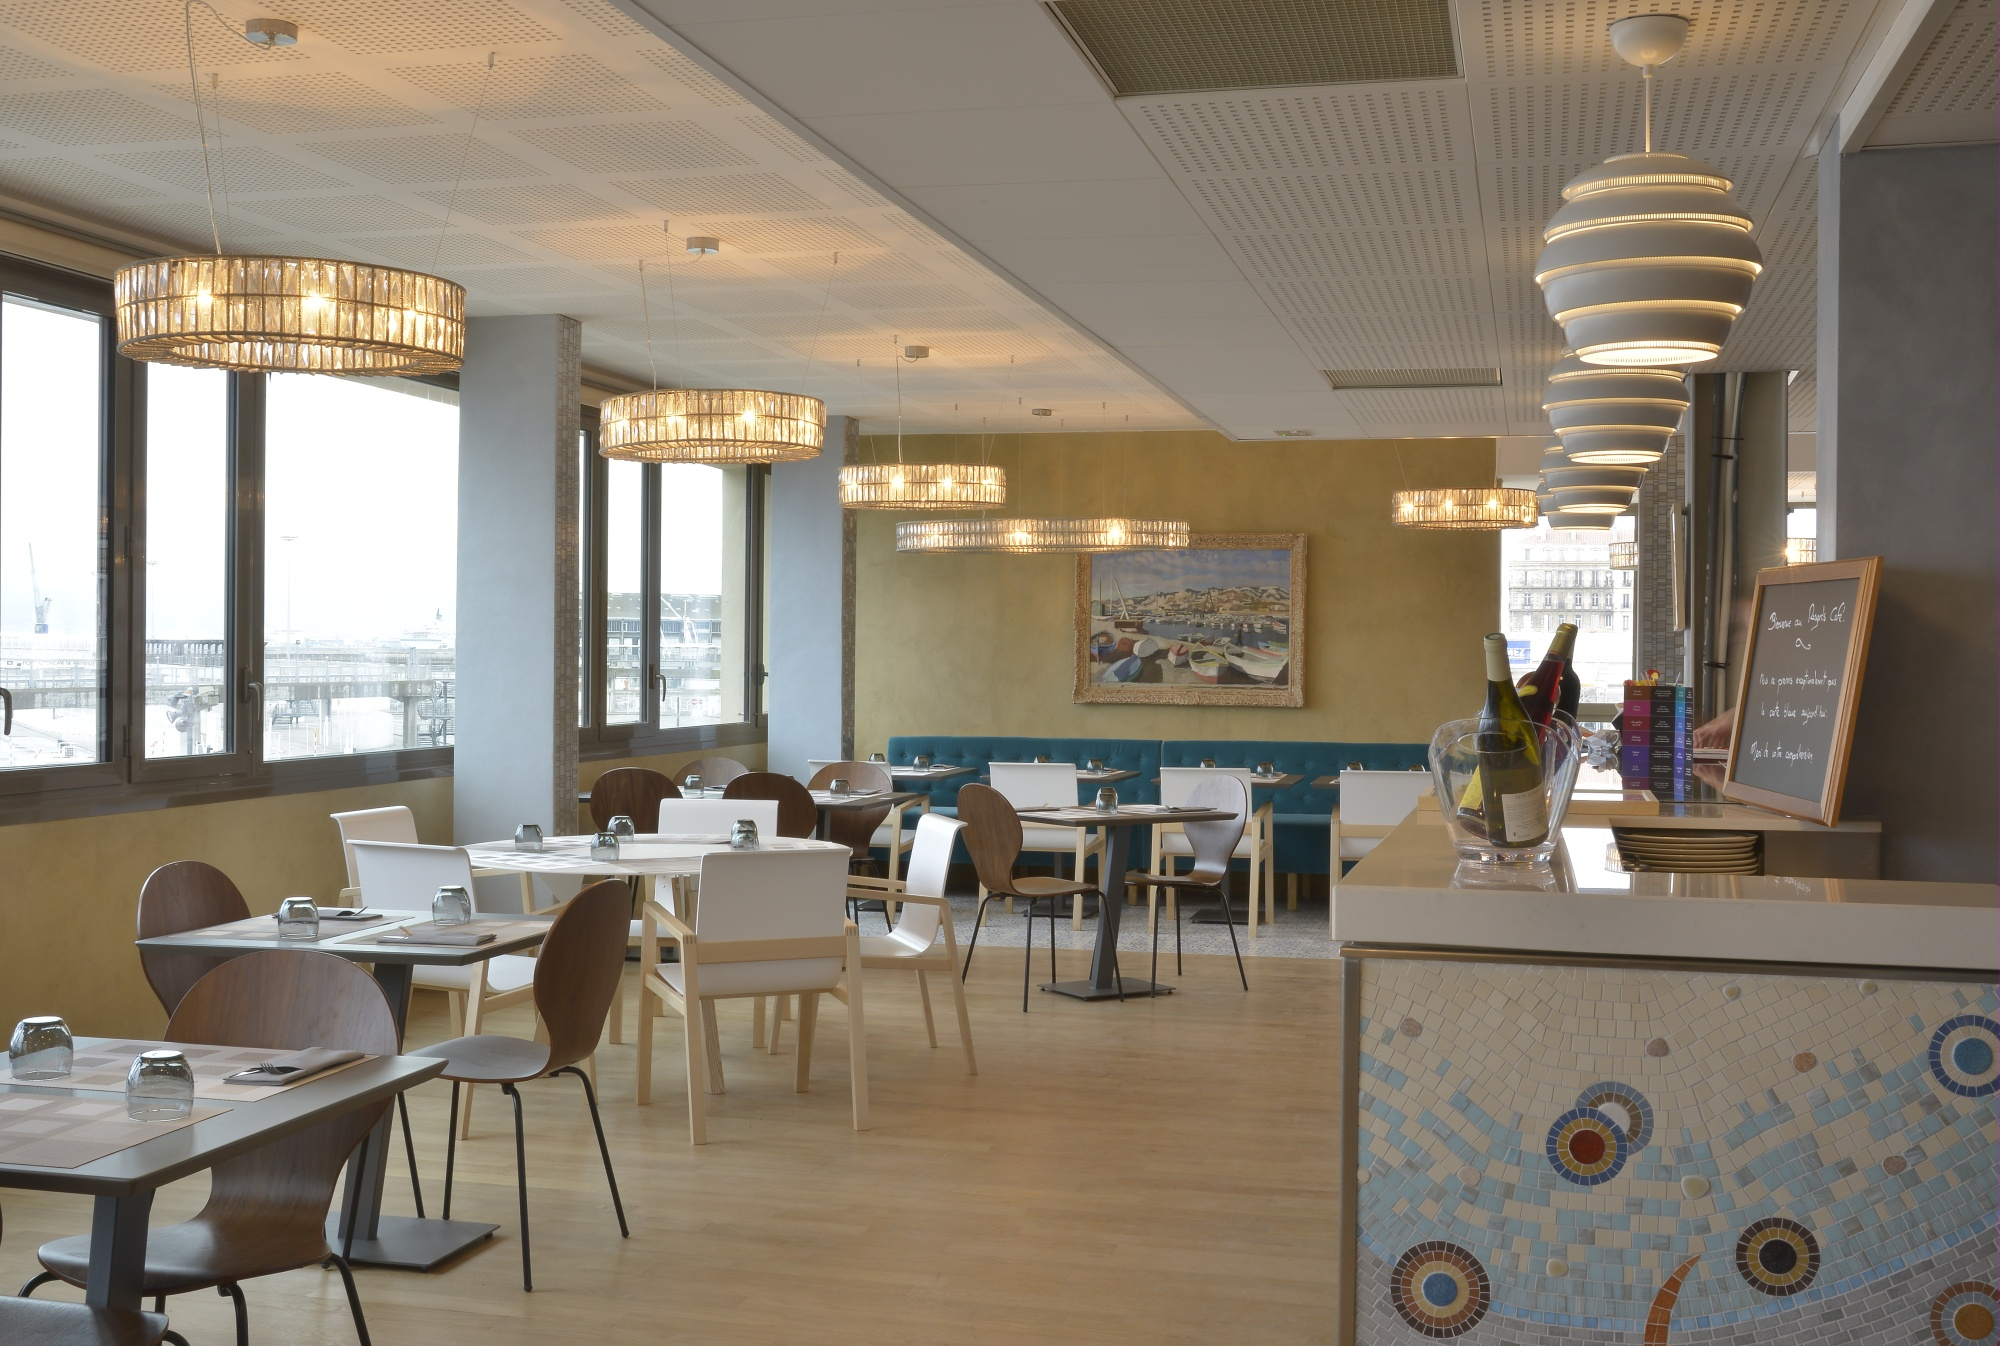 La Mer Vue Du Regards Cafe Mus 233 E Regards De Provence